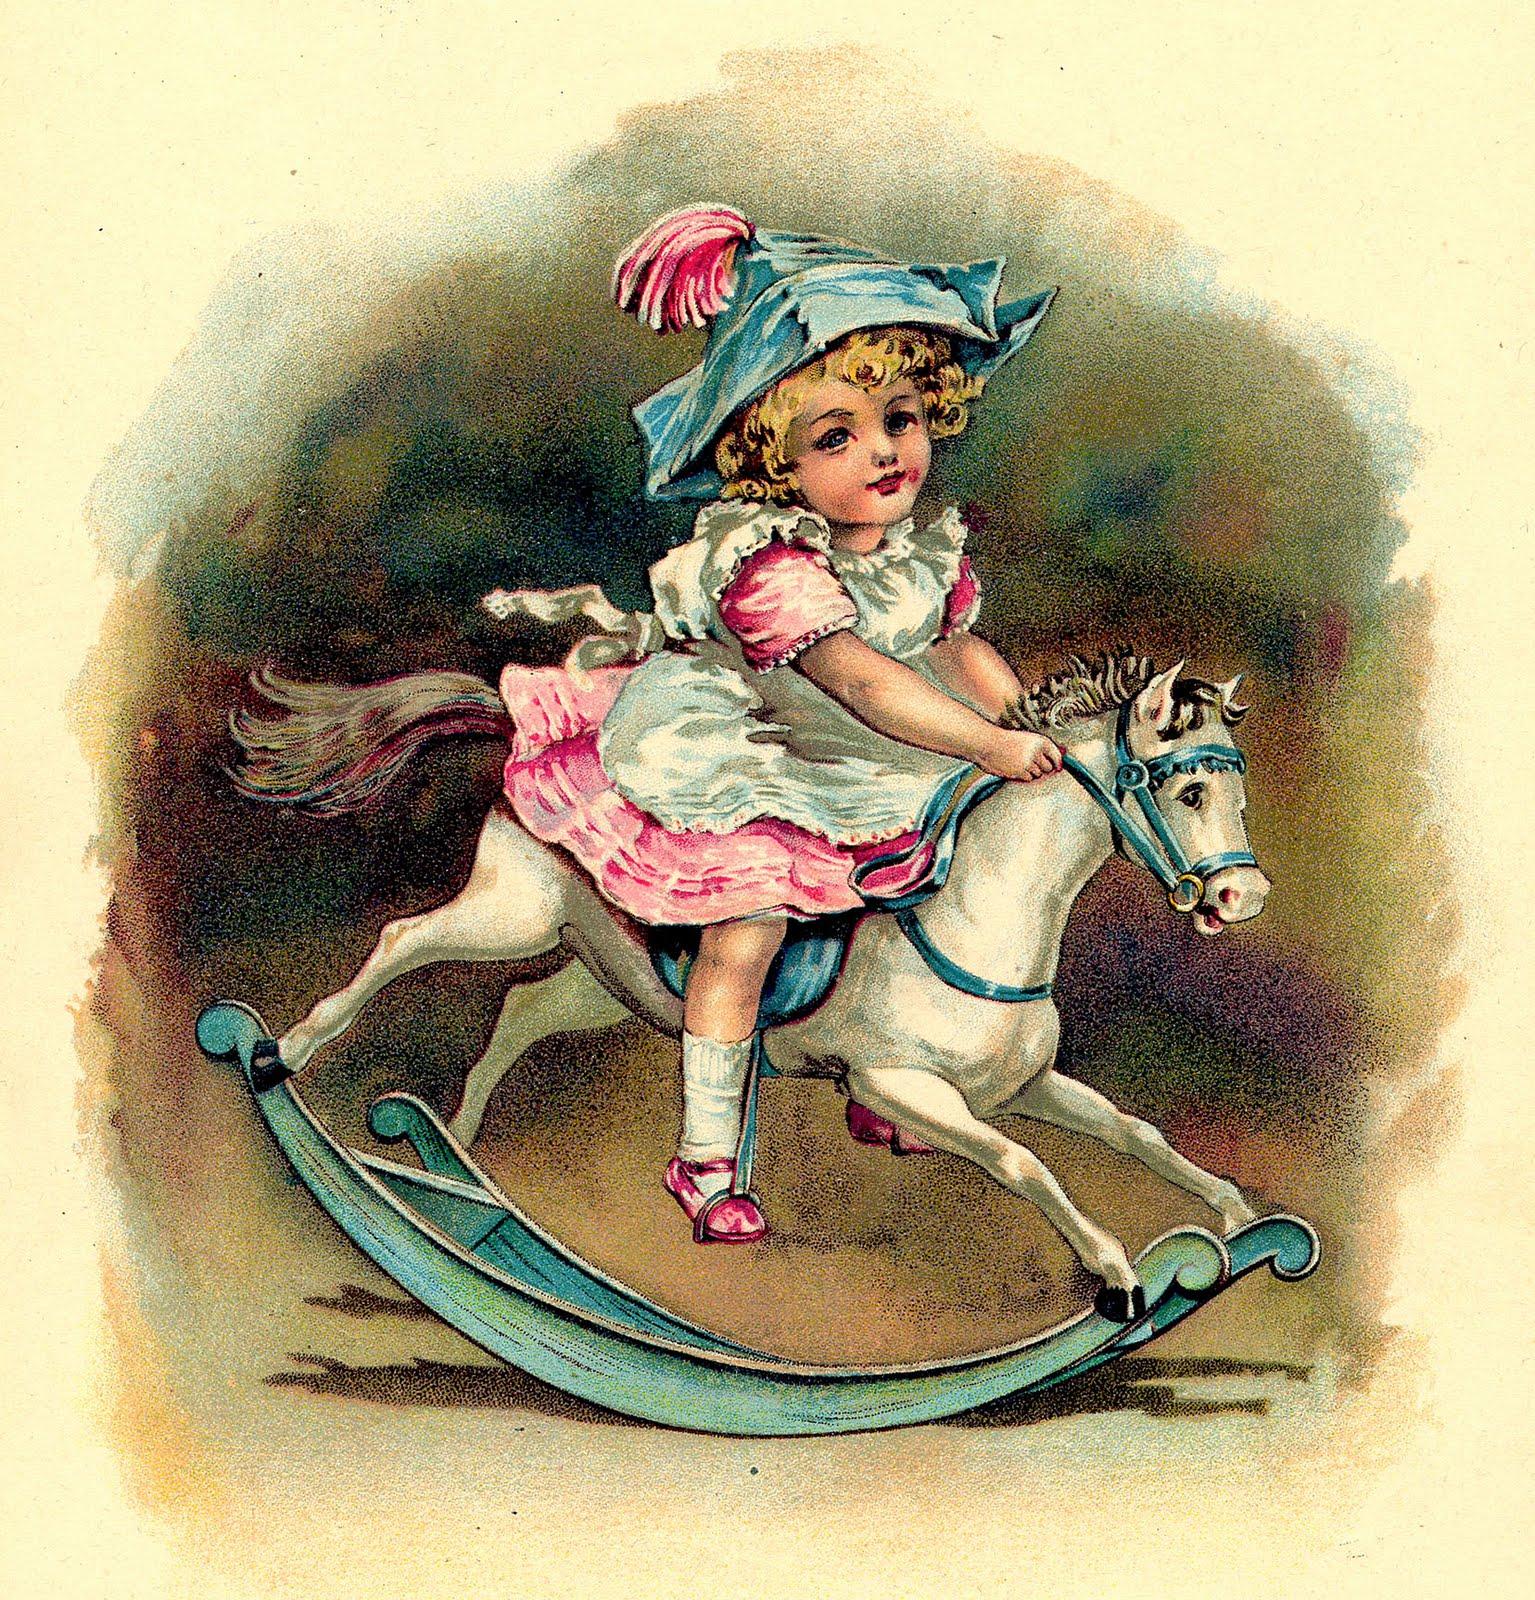 Vintage Nursery Rhyme Printable